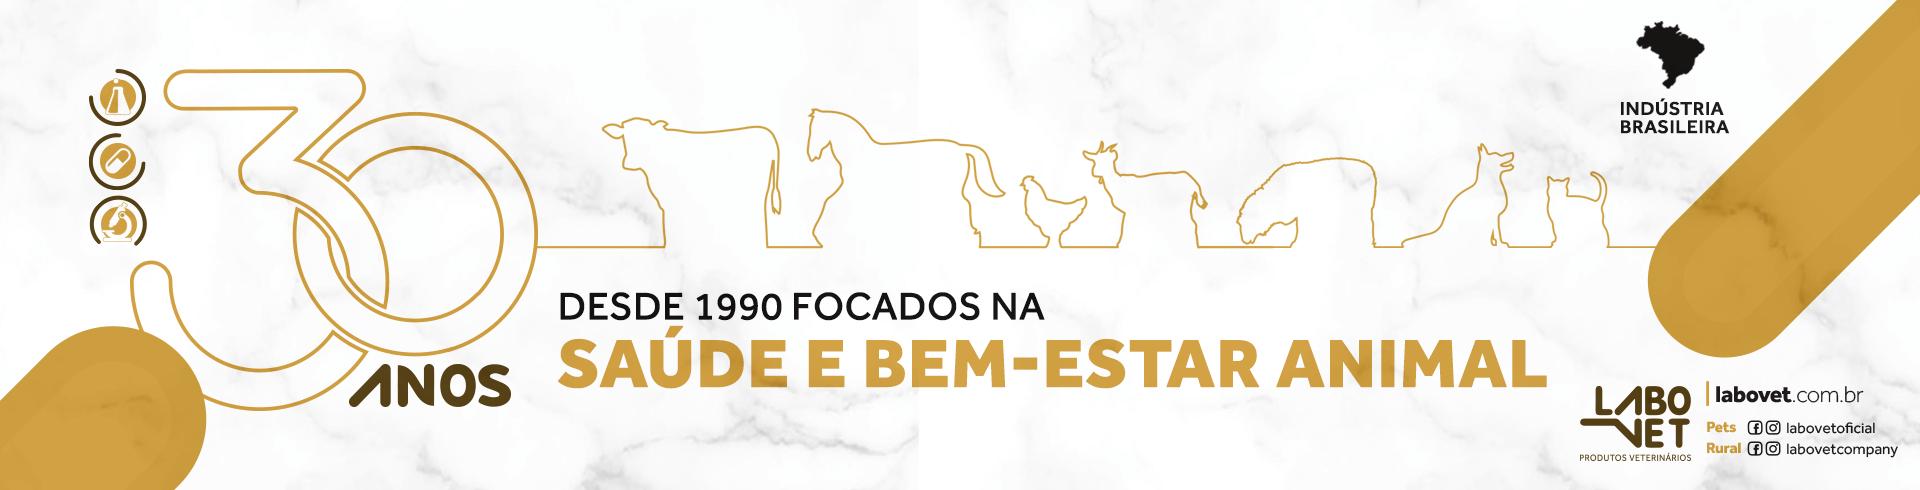 banner-site30anos-1920x490